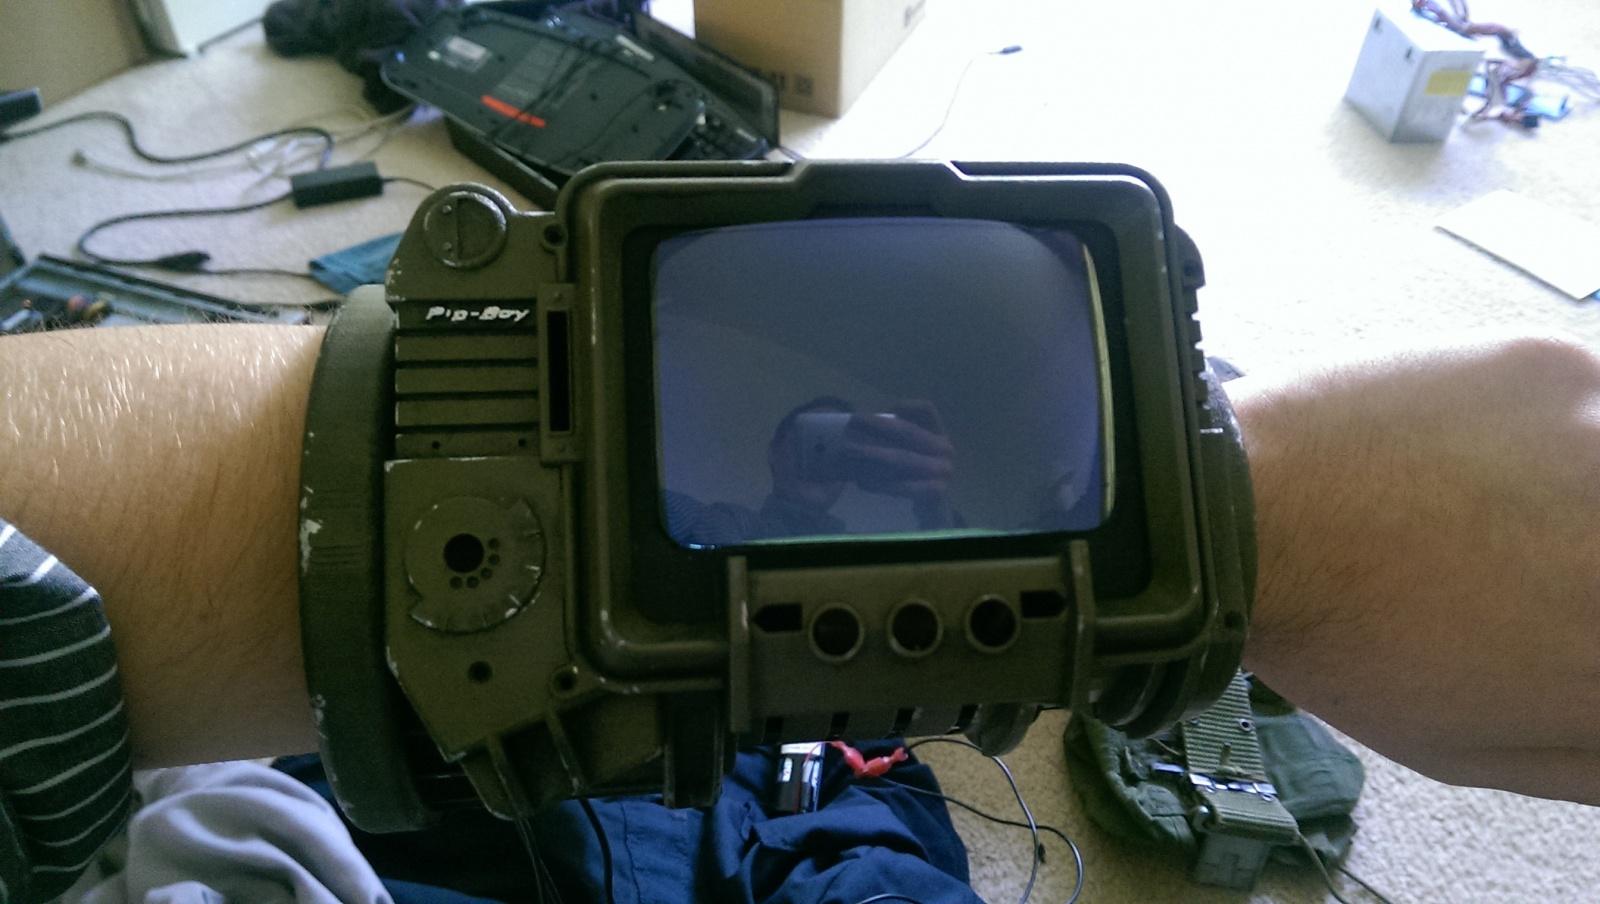 PipBoy из Fallout 3 на Raspberry Pi - 6